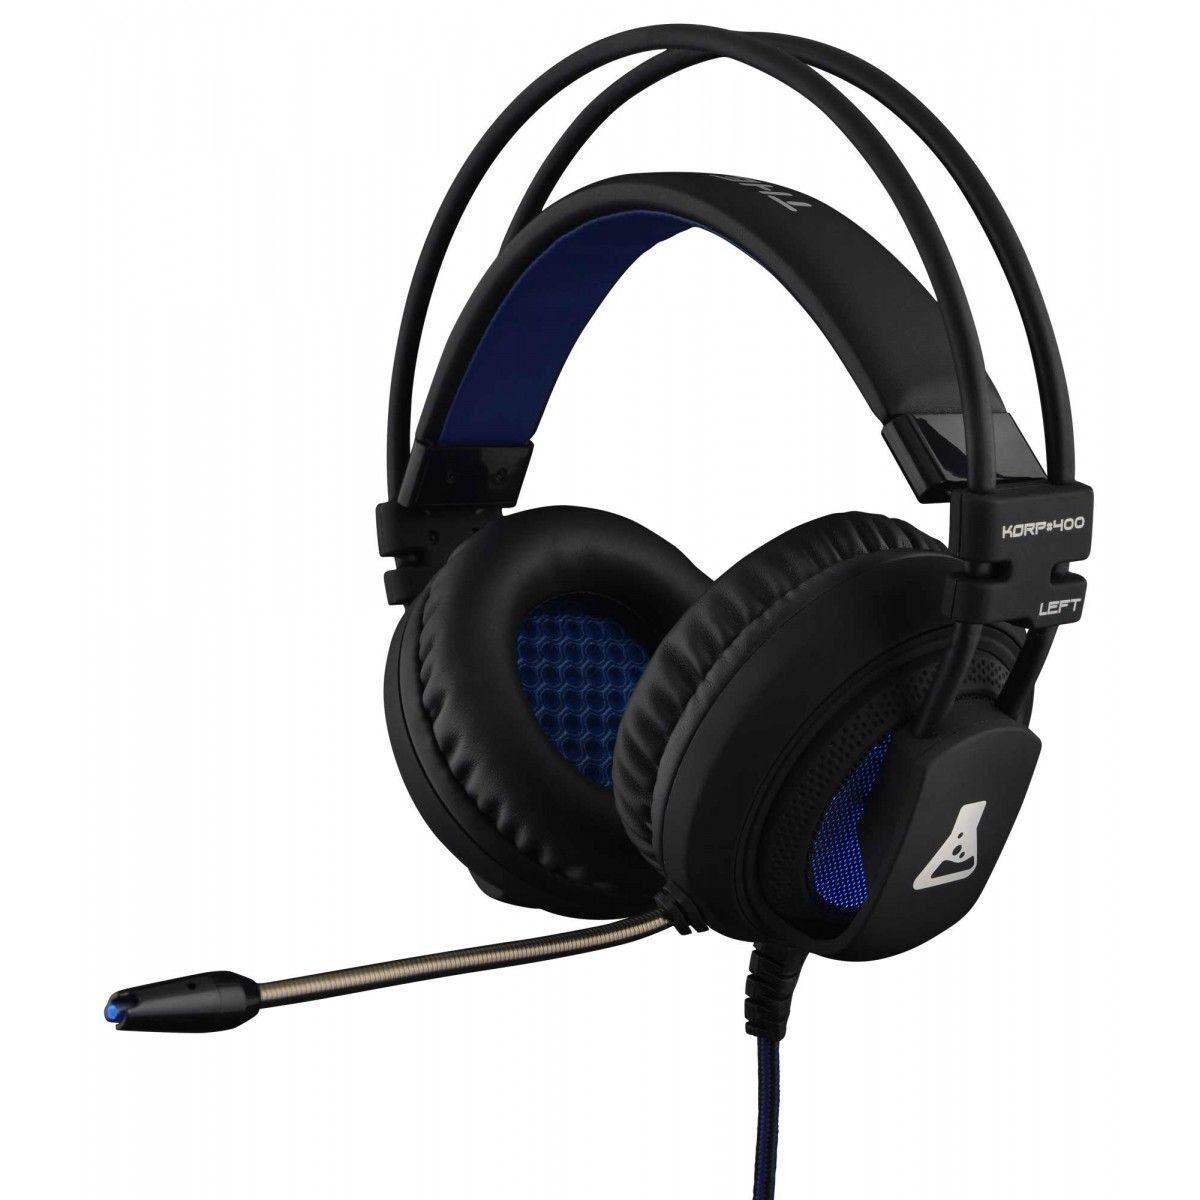 THE G-LAB Casque audio KORP 400